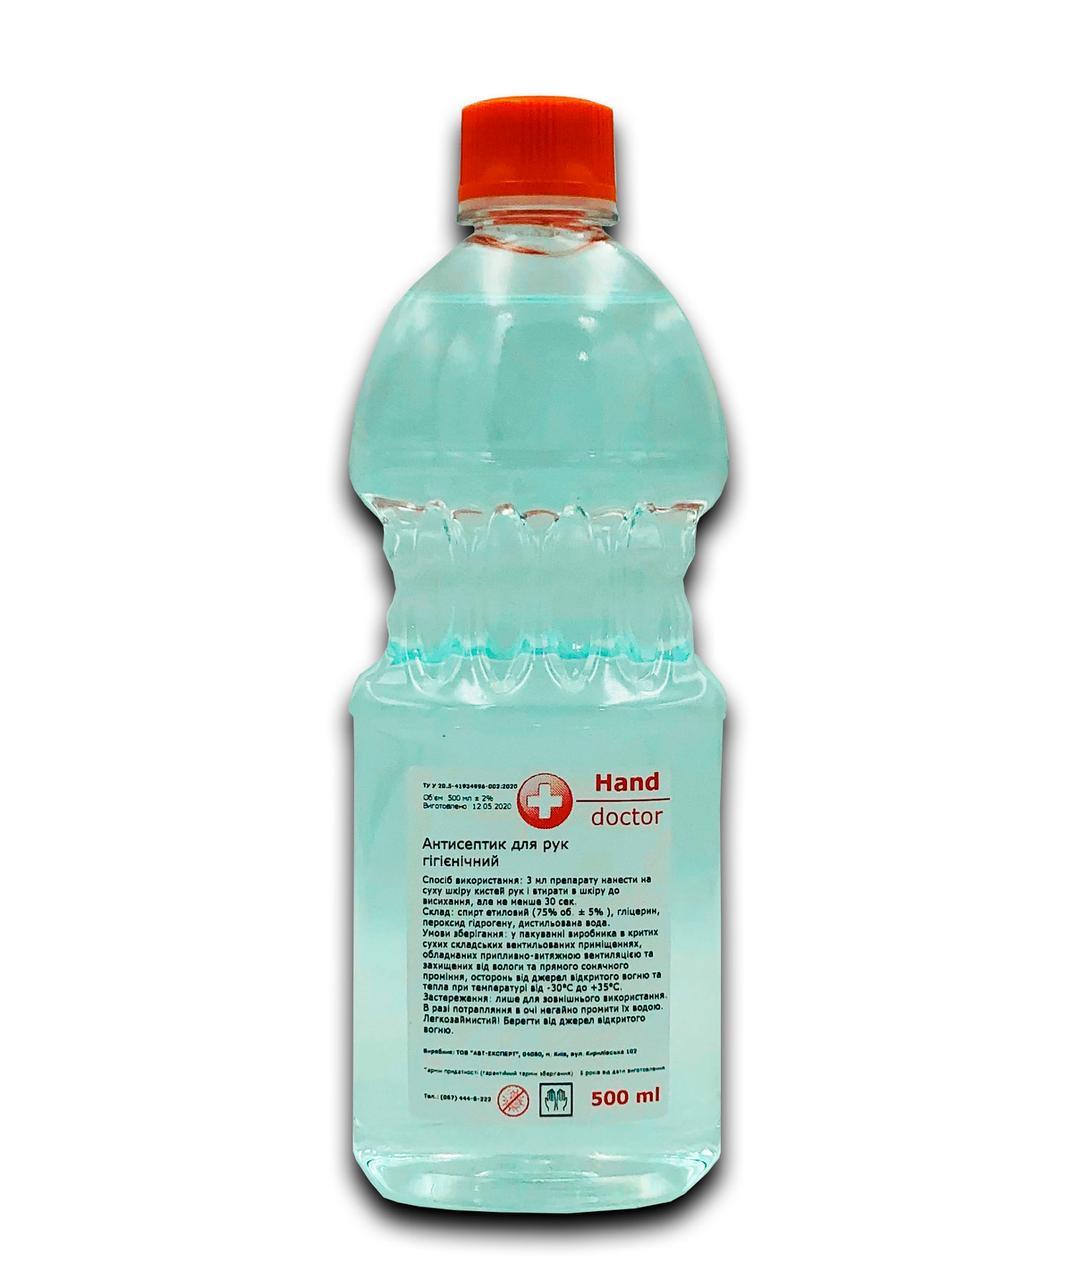 Антисептик спиртовой для рук 75% спирта Hand Doctor 500 мл.